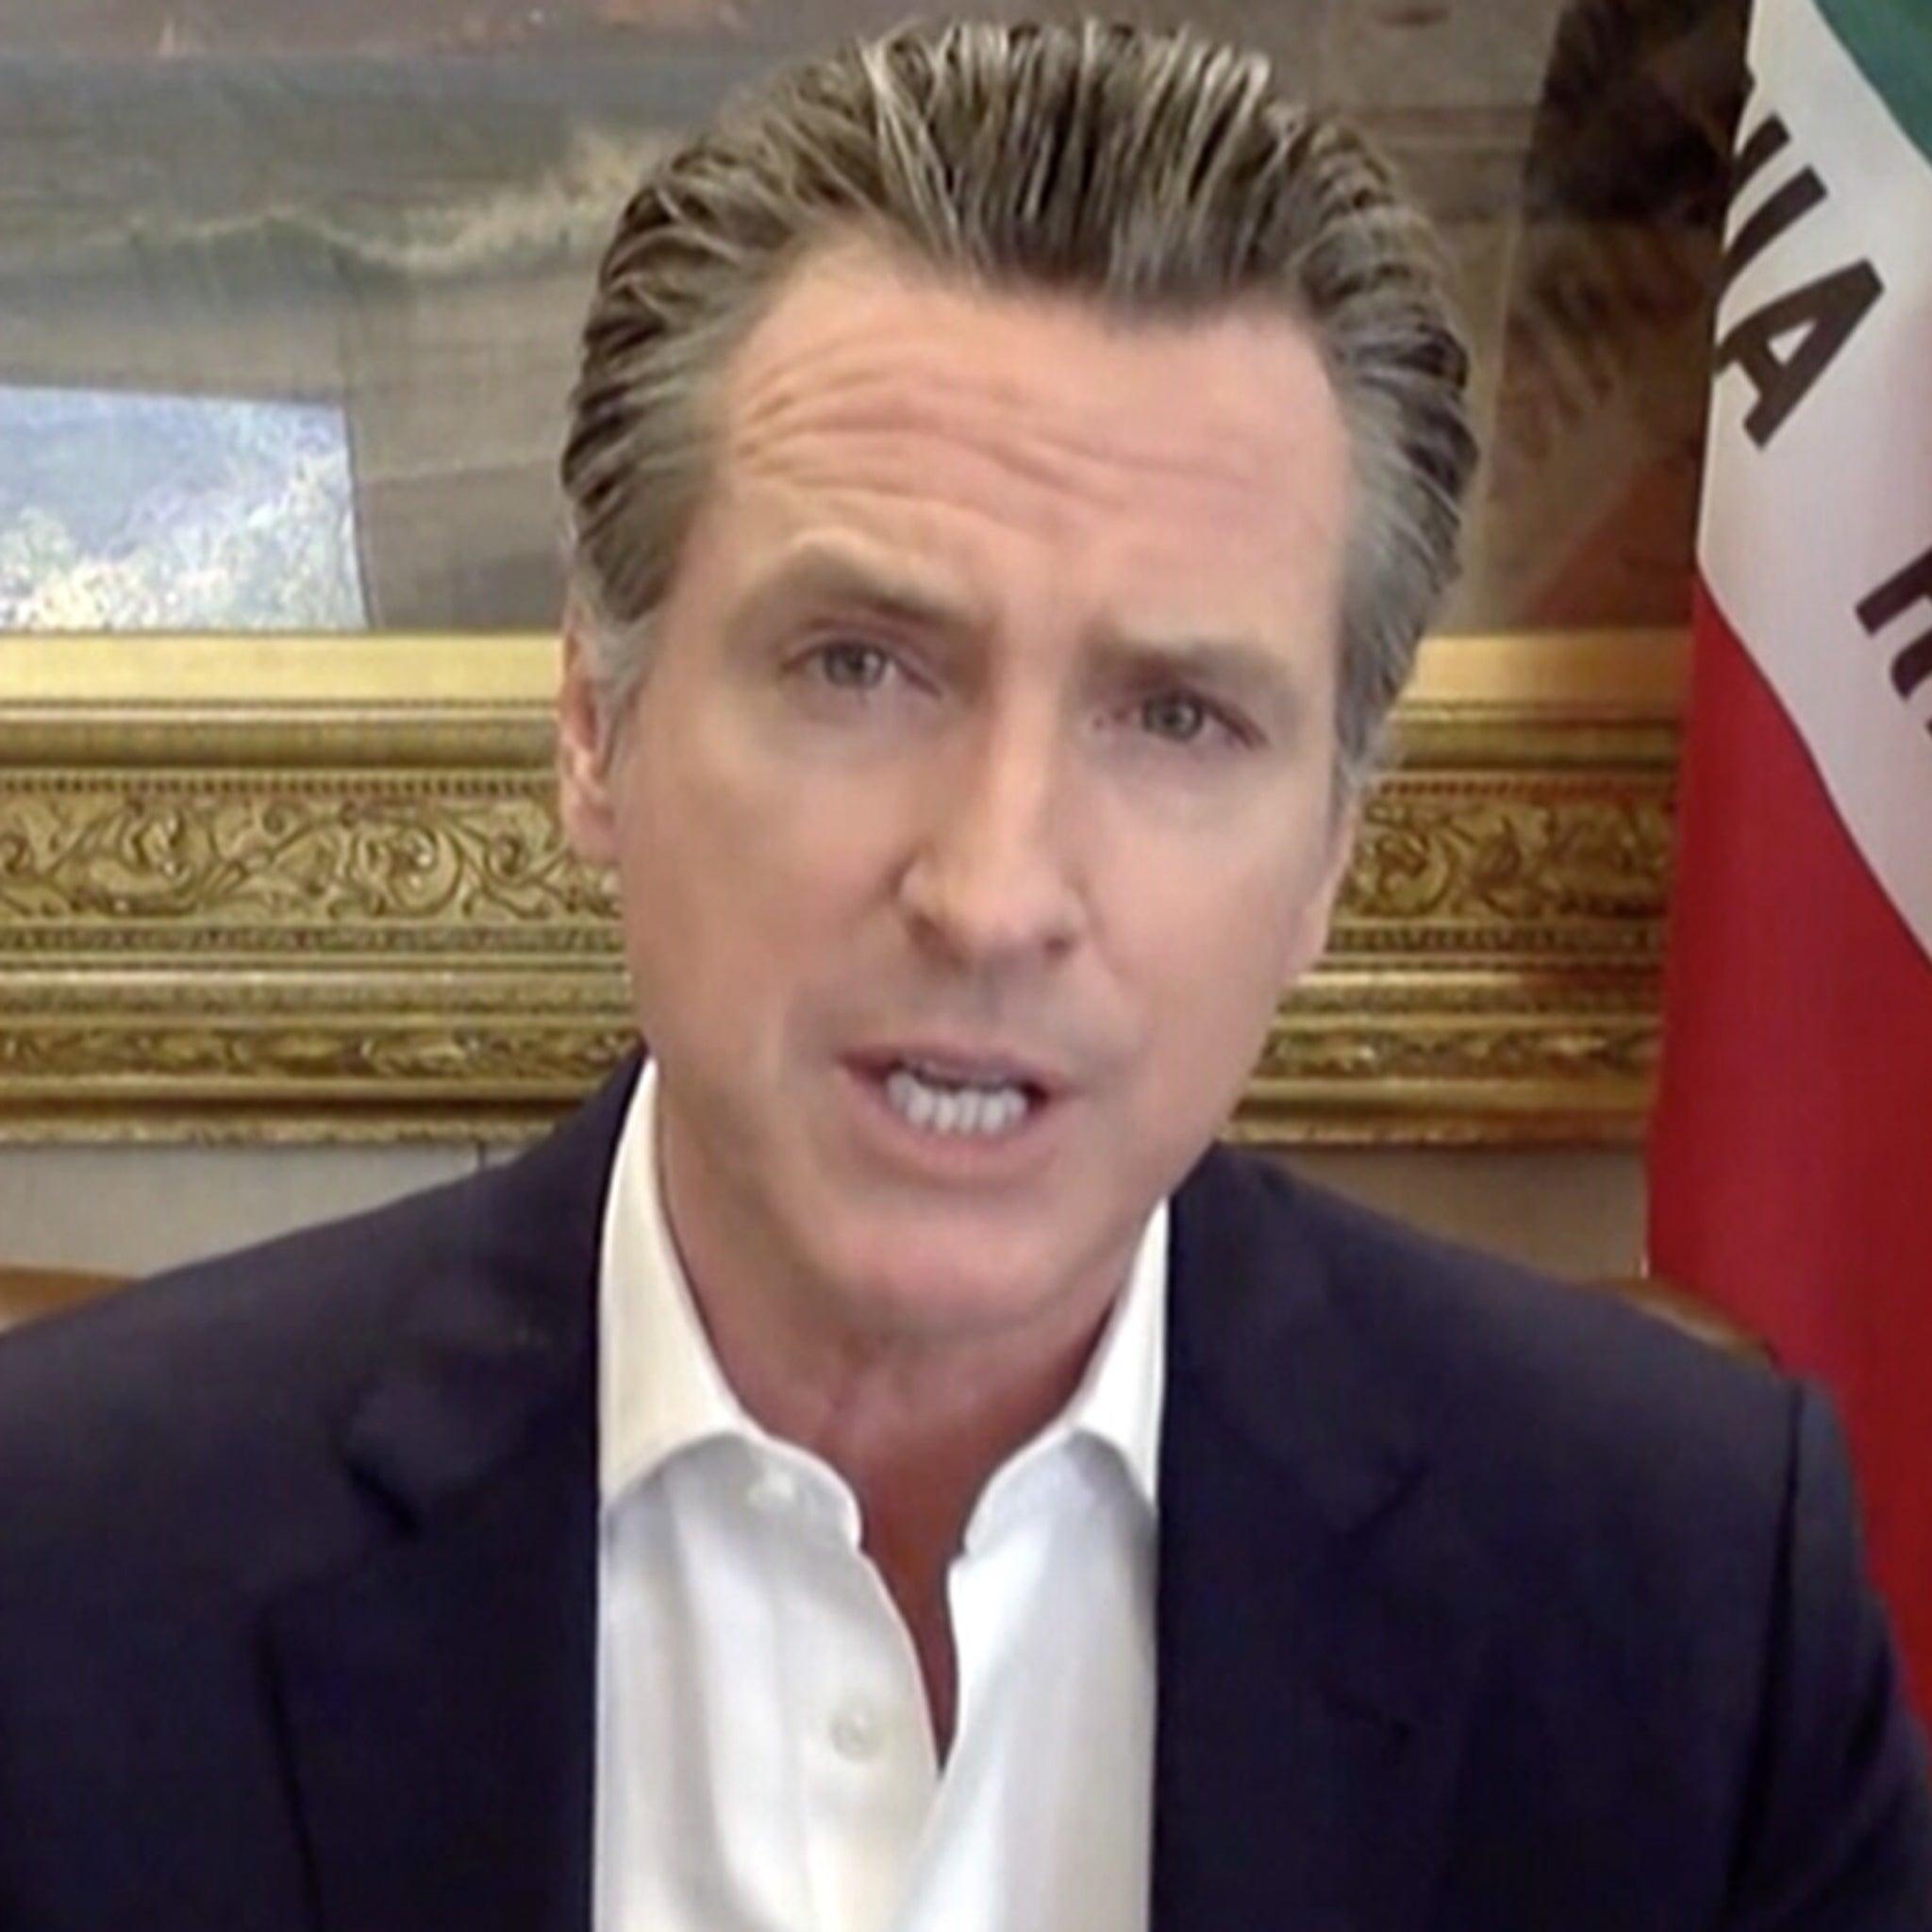 CA Gov. Gavin Newsom Punches Back at Trump Threat to Cut Fire Aid